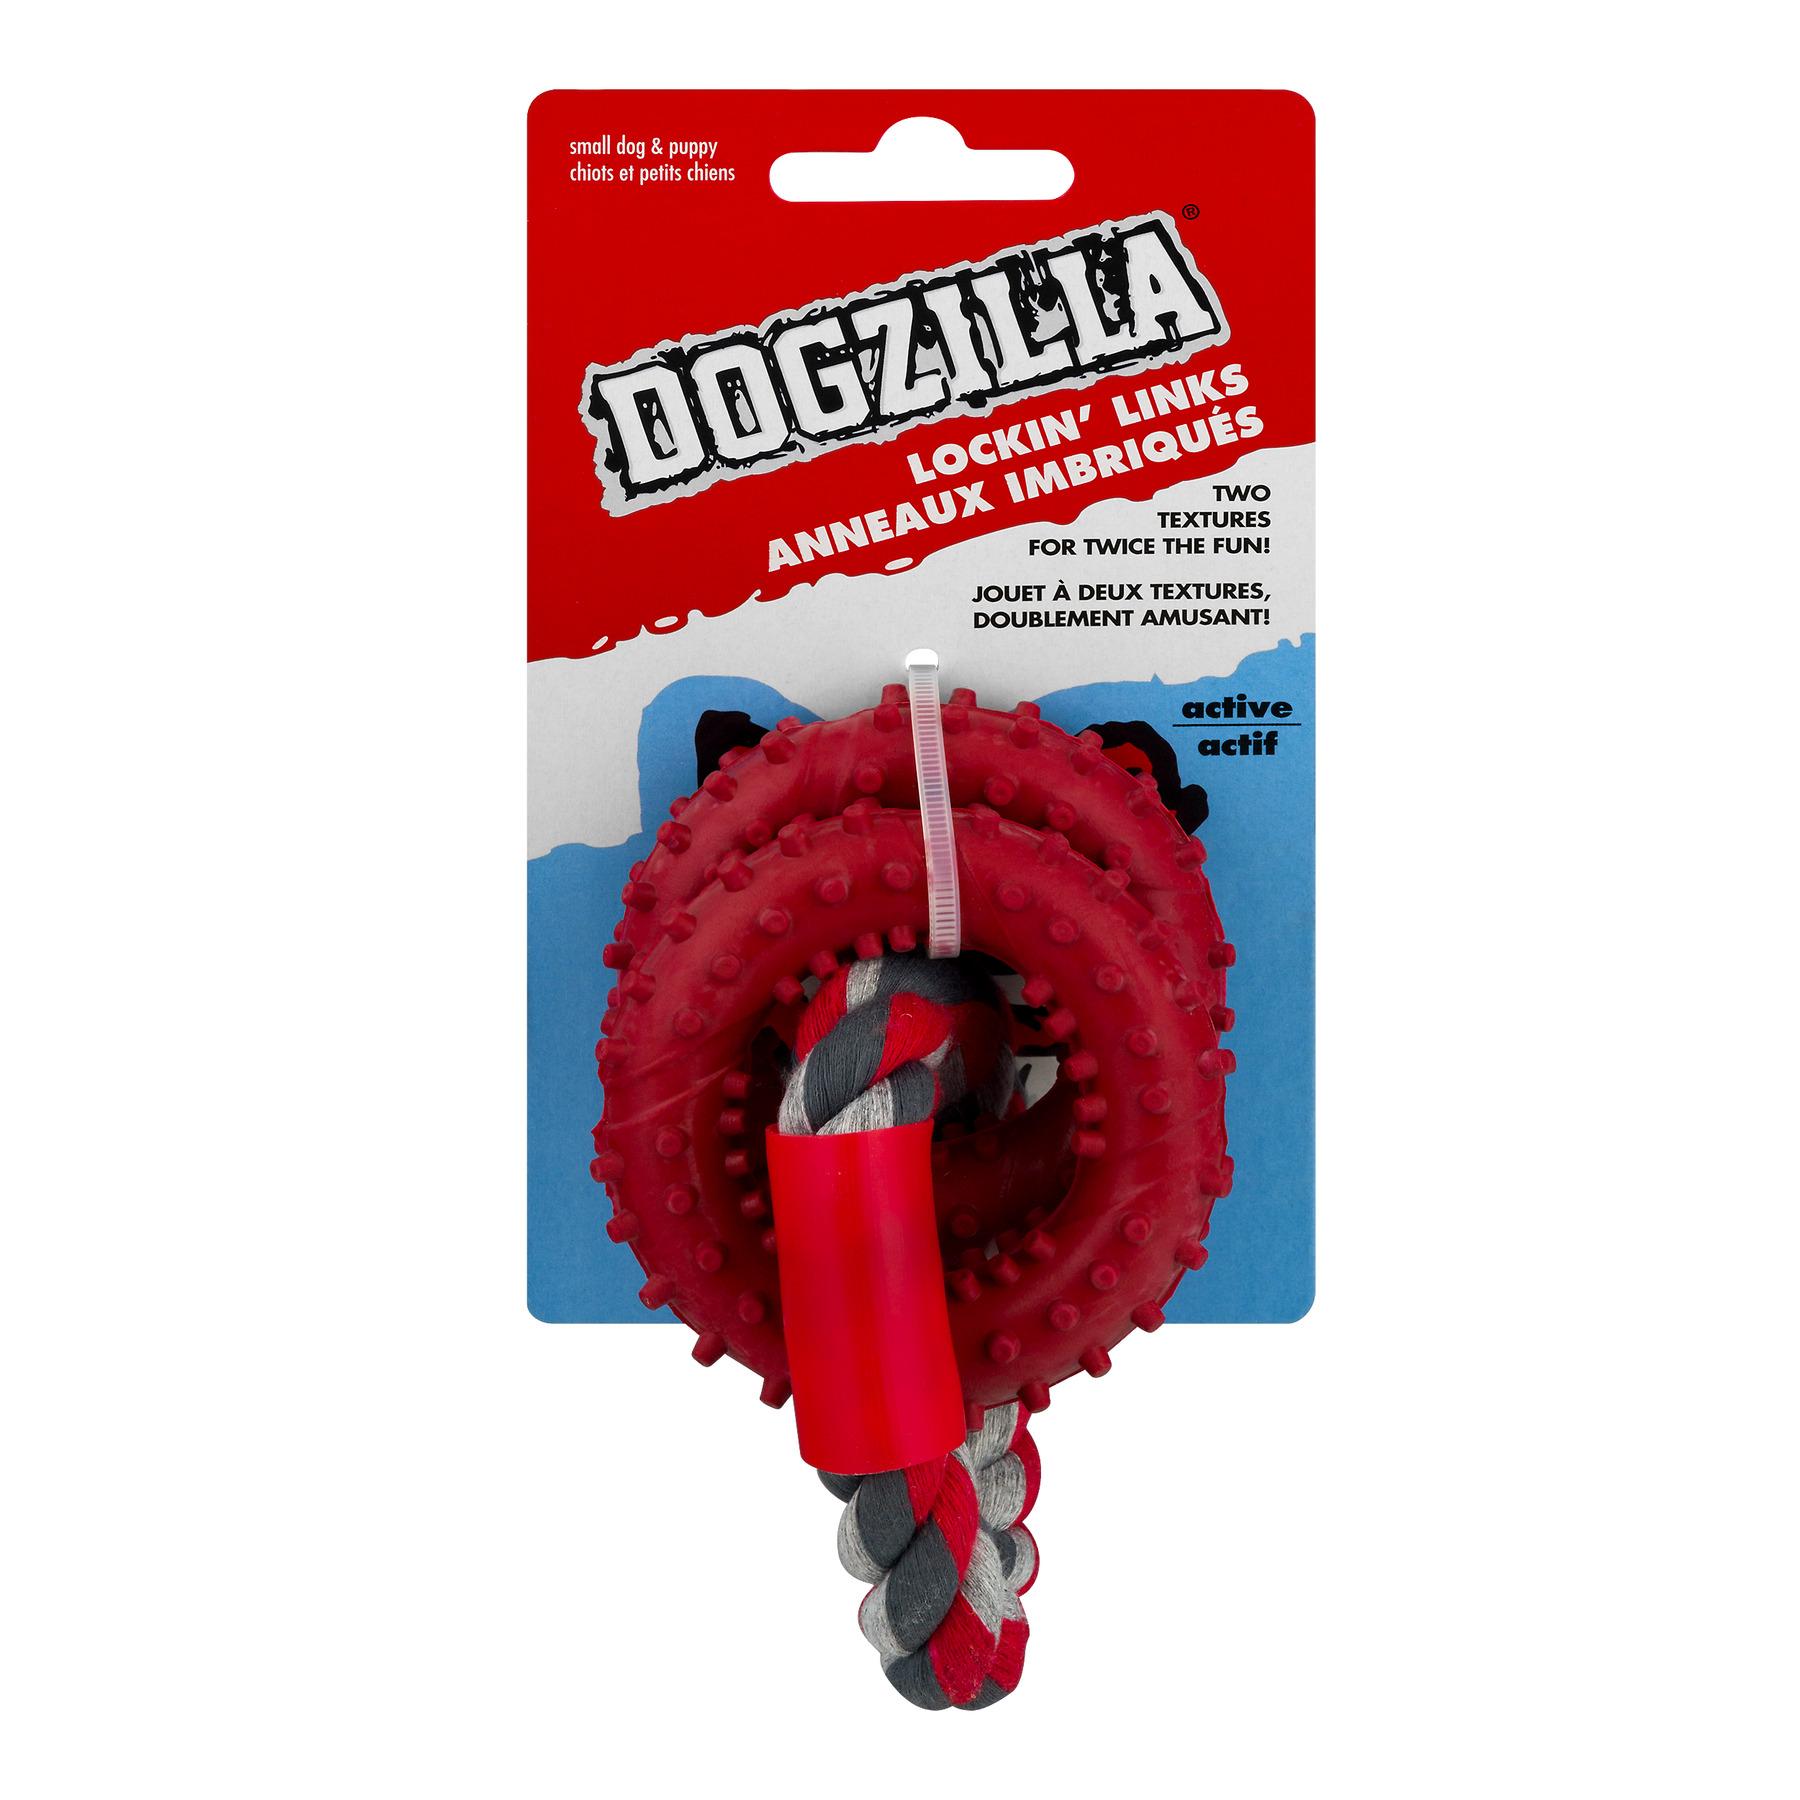 Dogzilla Lockin' Links Small Dog & Puppy, 1.0 CT